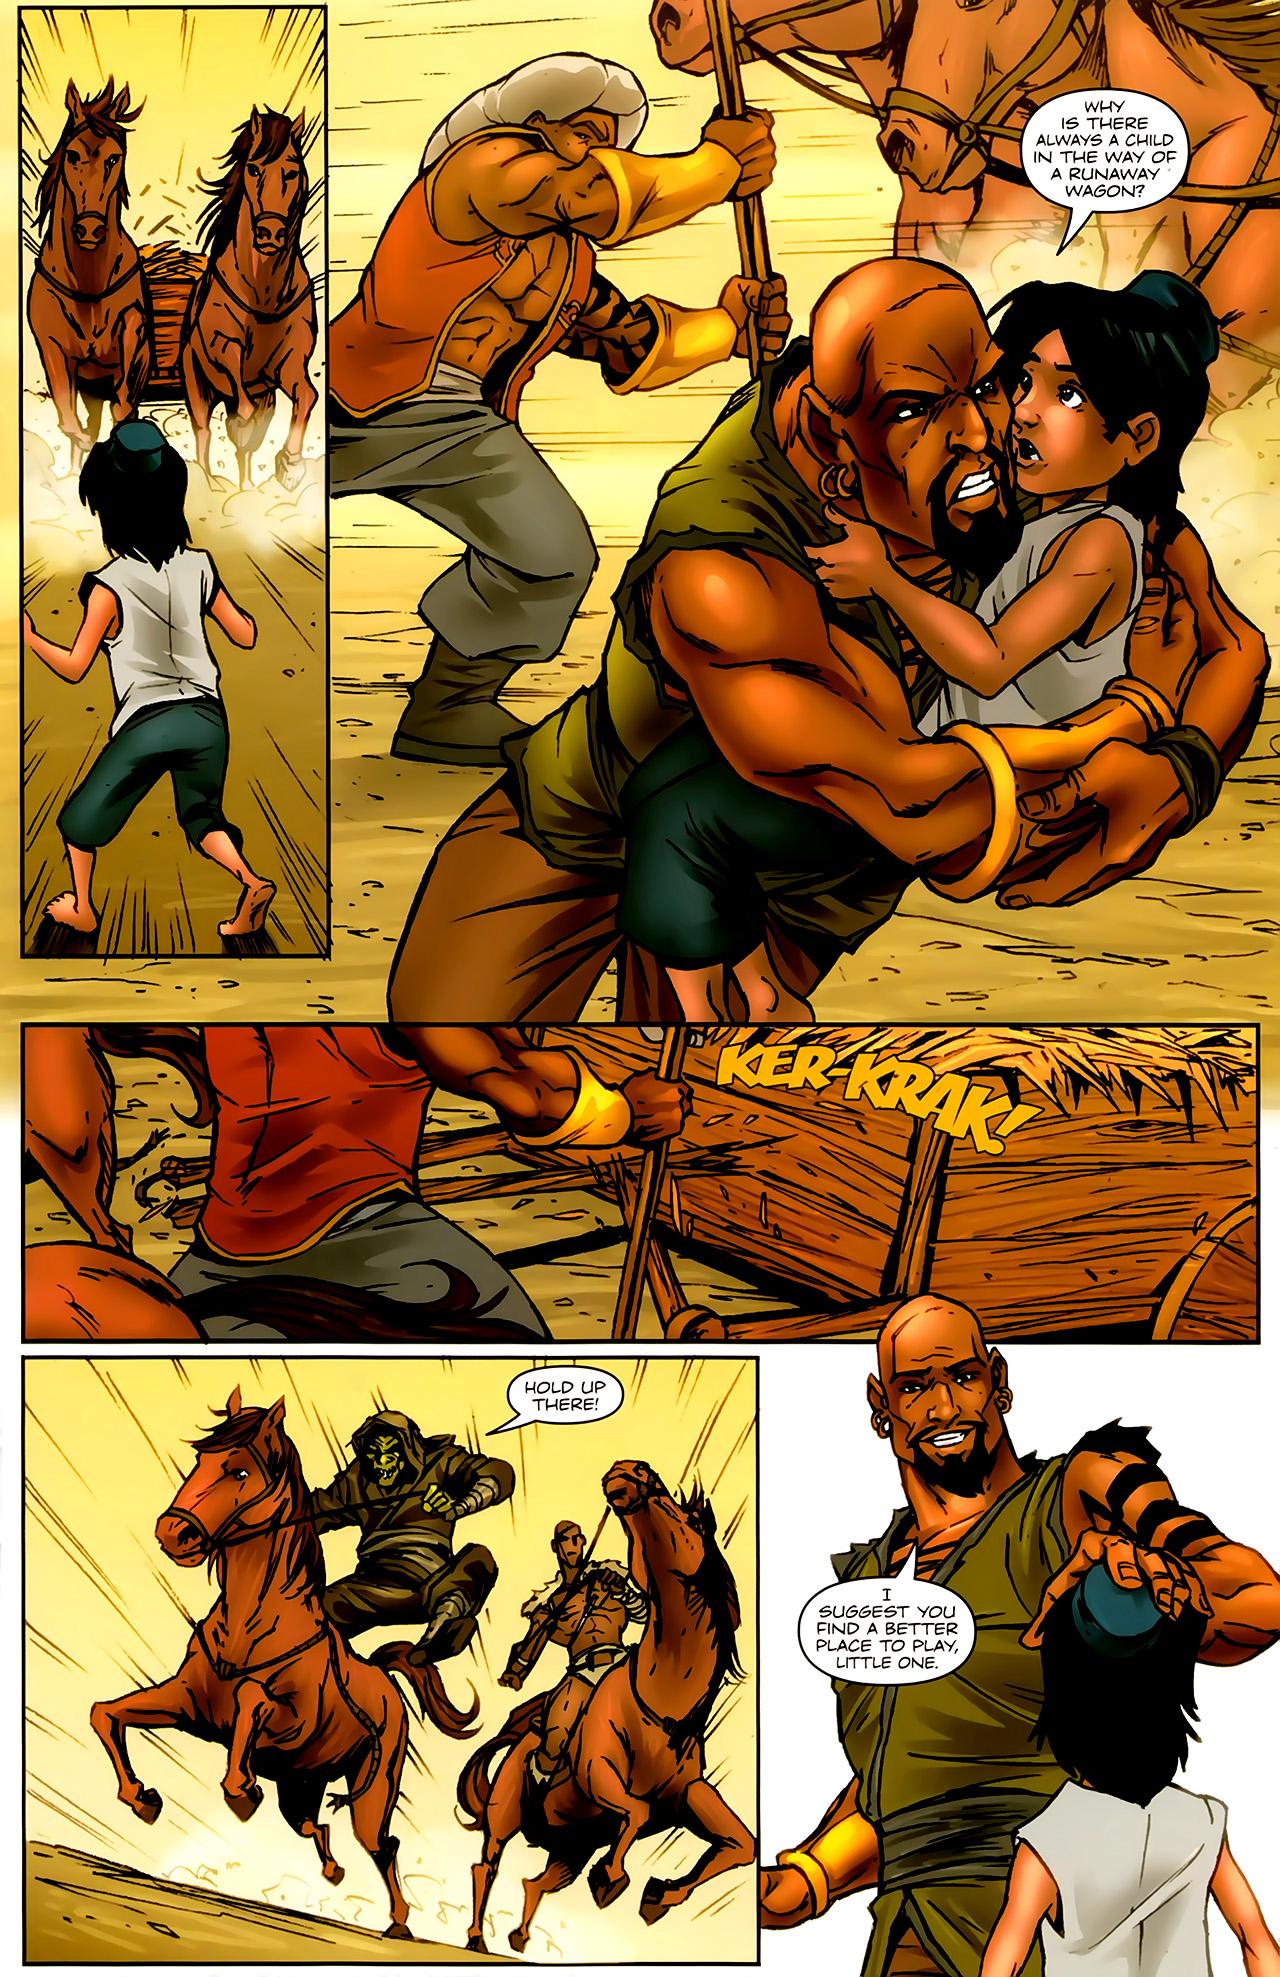 Read online 1001 Arabian Nights: The Adventures of Sinbad comic -  Issue #9 - 7